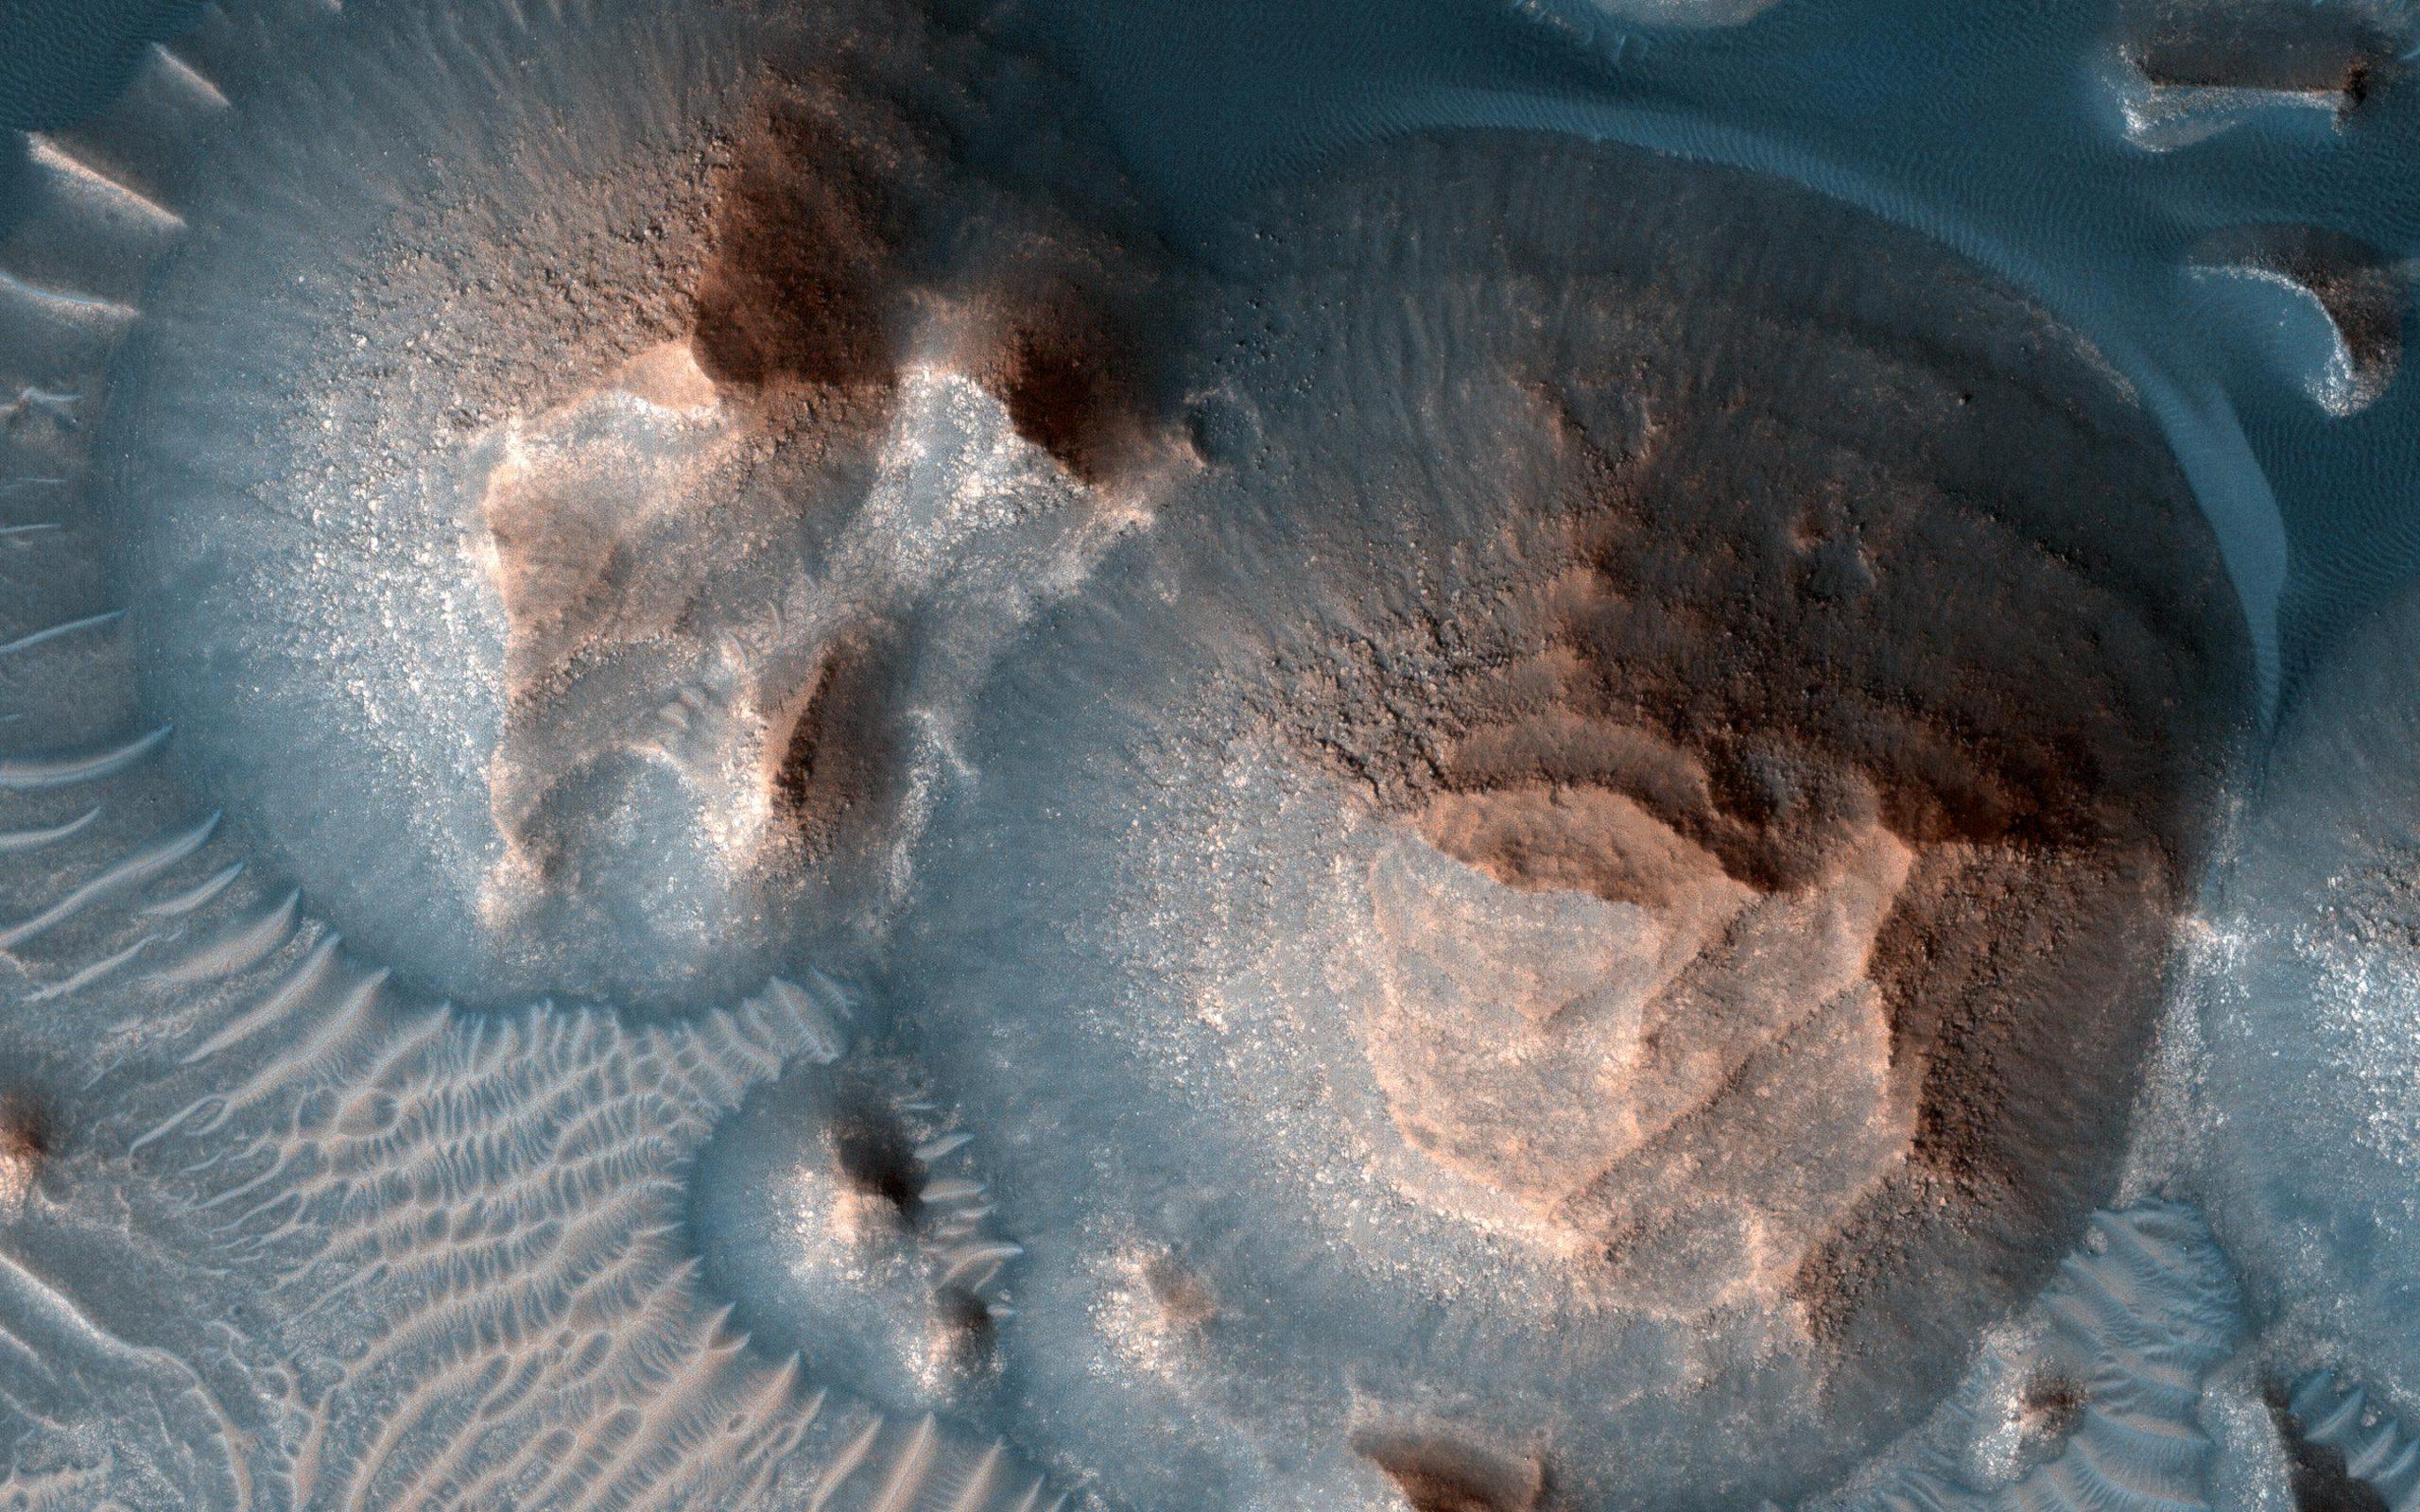 Several craters of the Arabia Terra region on Mars. Credit: NASA